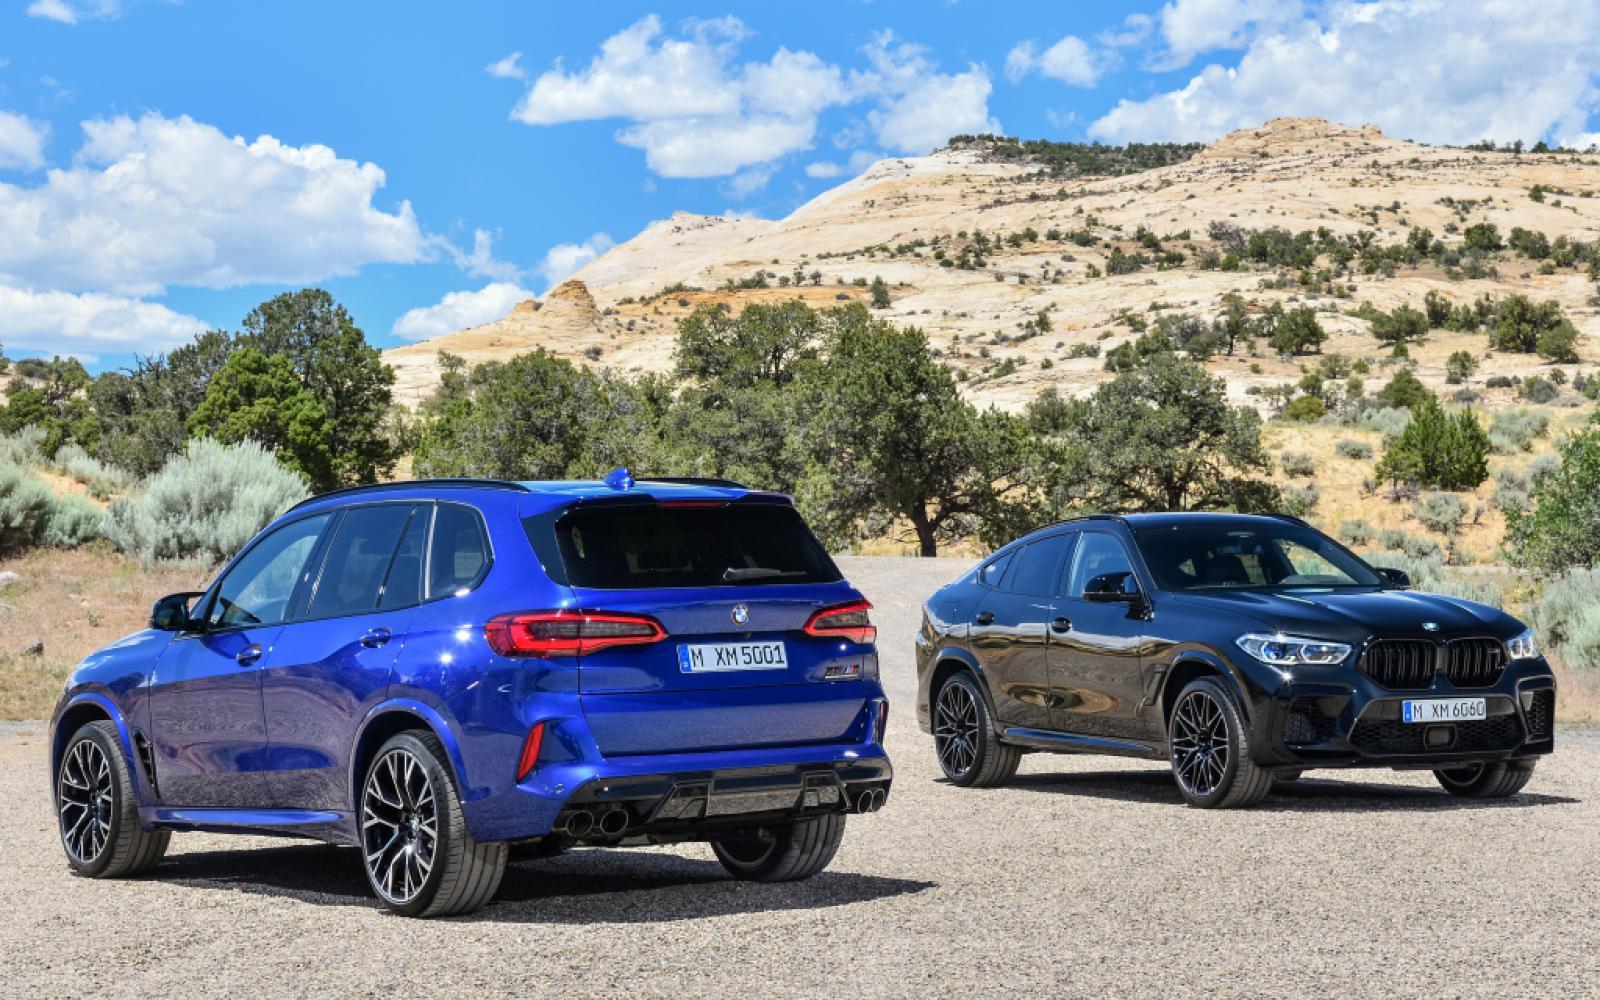 Test BMW X5 M: anderhalve meter afstand